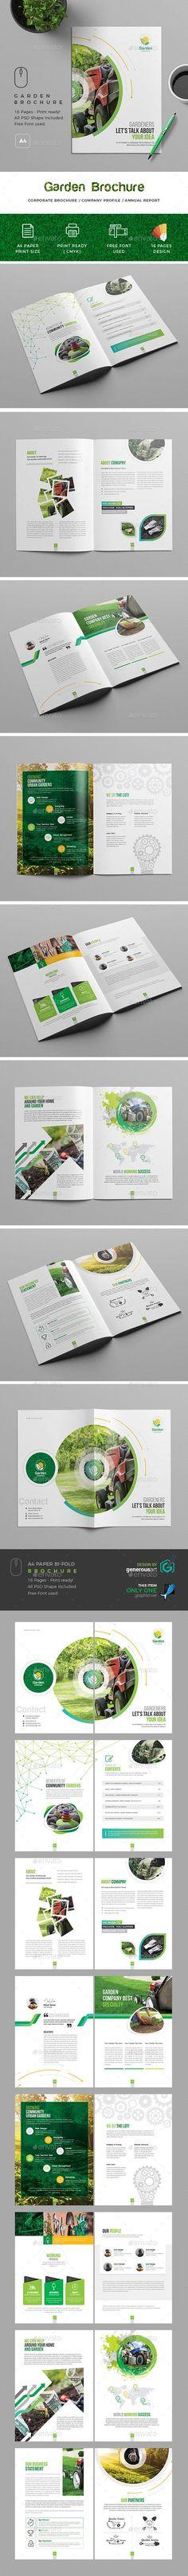 Garden Brochure Template — Photoshop PSD #presentation #company • Download ➝ https://graphicriver.net/item/garden-brochure-template/20451076?ref=pxcr